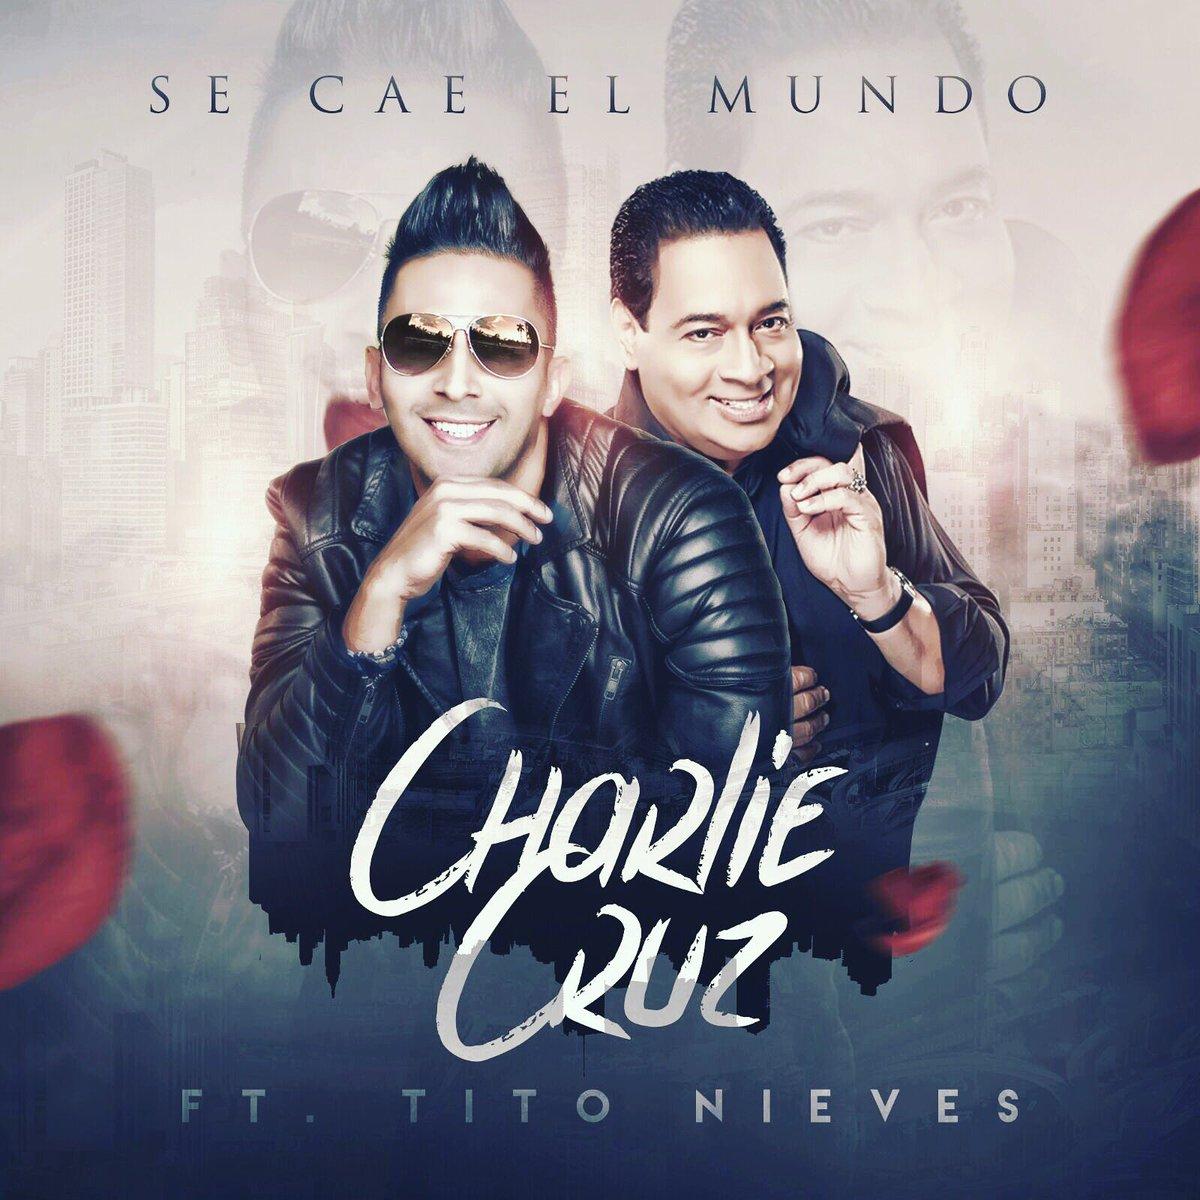 Se Cae El Mundo Charlie Cruz junto a Tito Nieves!!!! #Diosesbuenisimo https://t.co/POvMmeXFSI